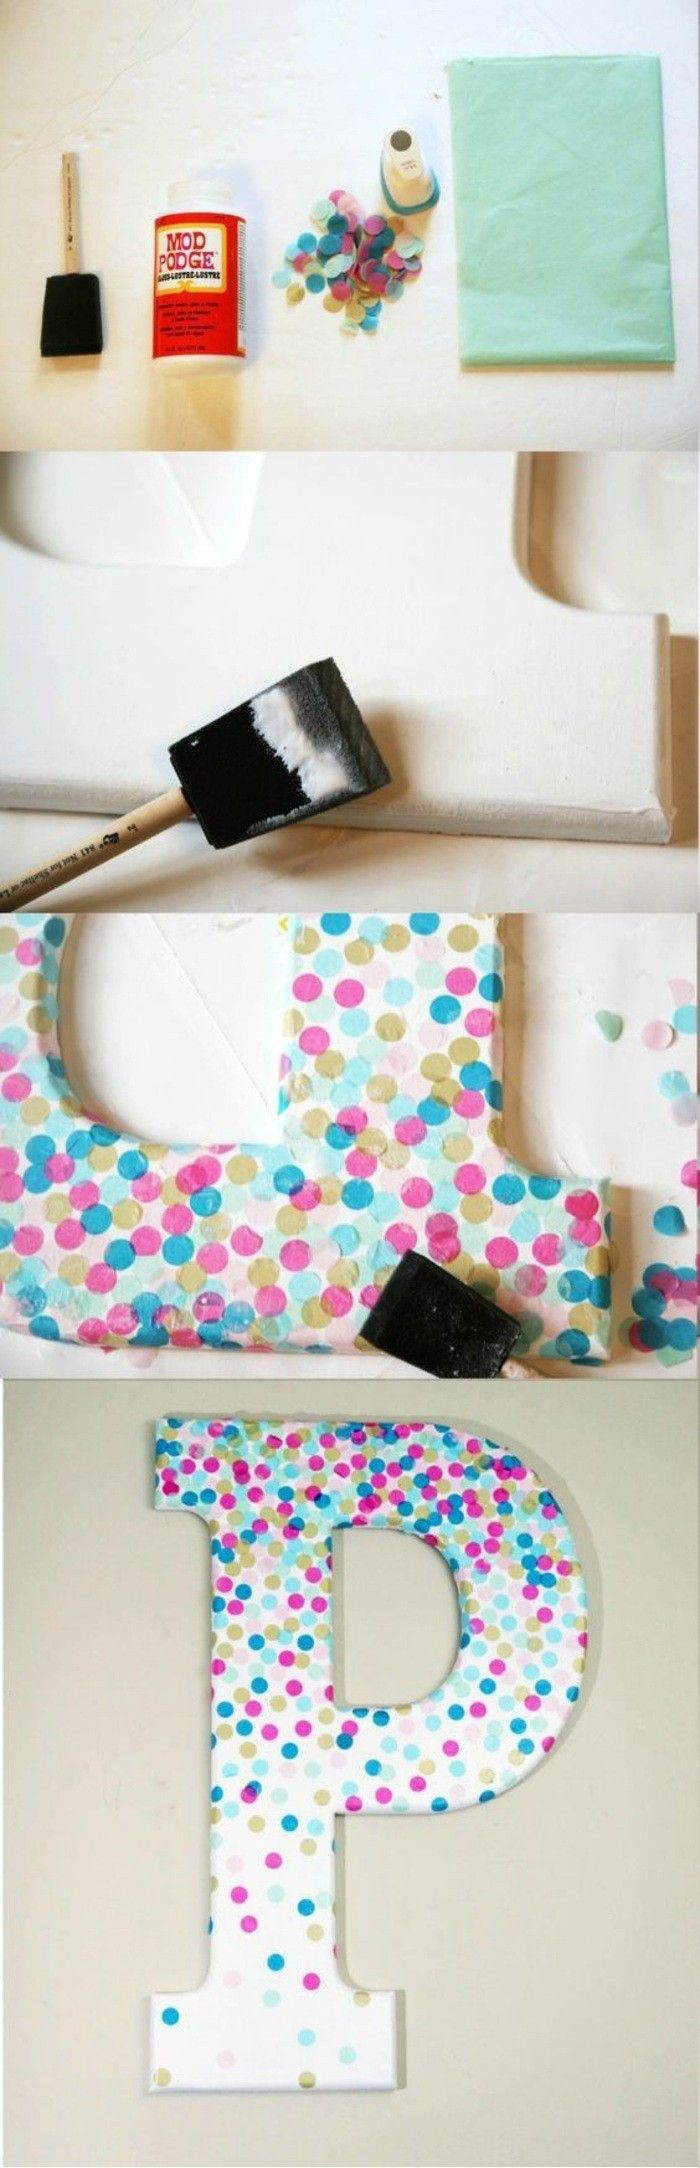 Beautiful Wanddeko Selber Machen Wohnideen Selber Machen Buchstabe Mit Buntem Papier  Dekorieren Good Looking